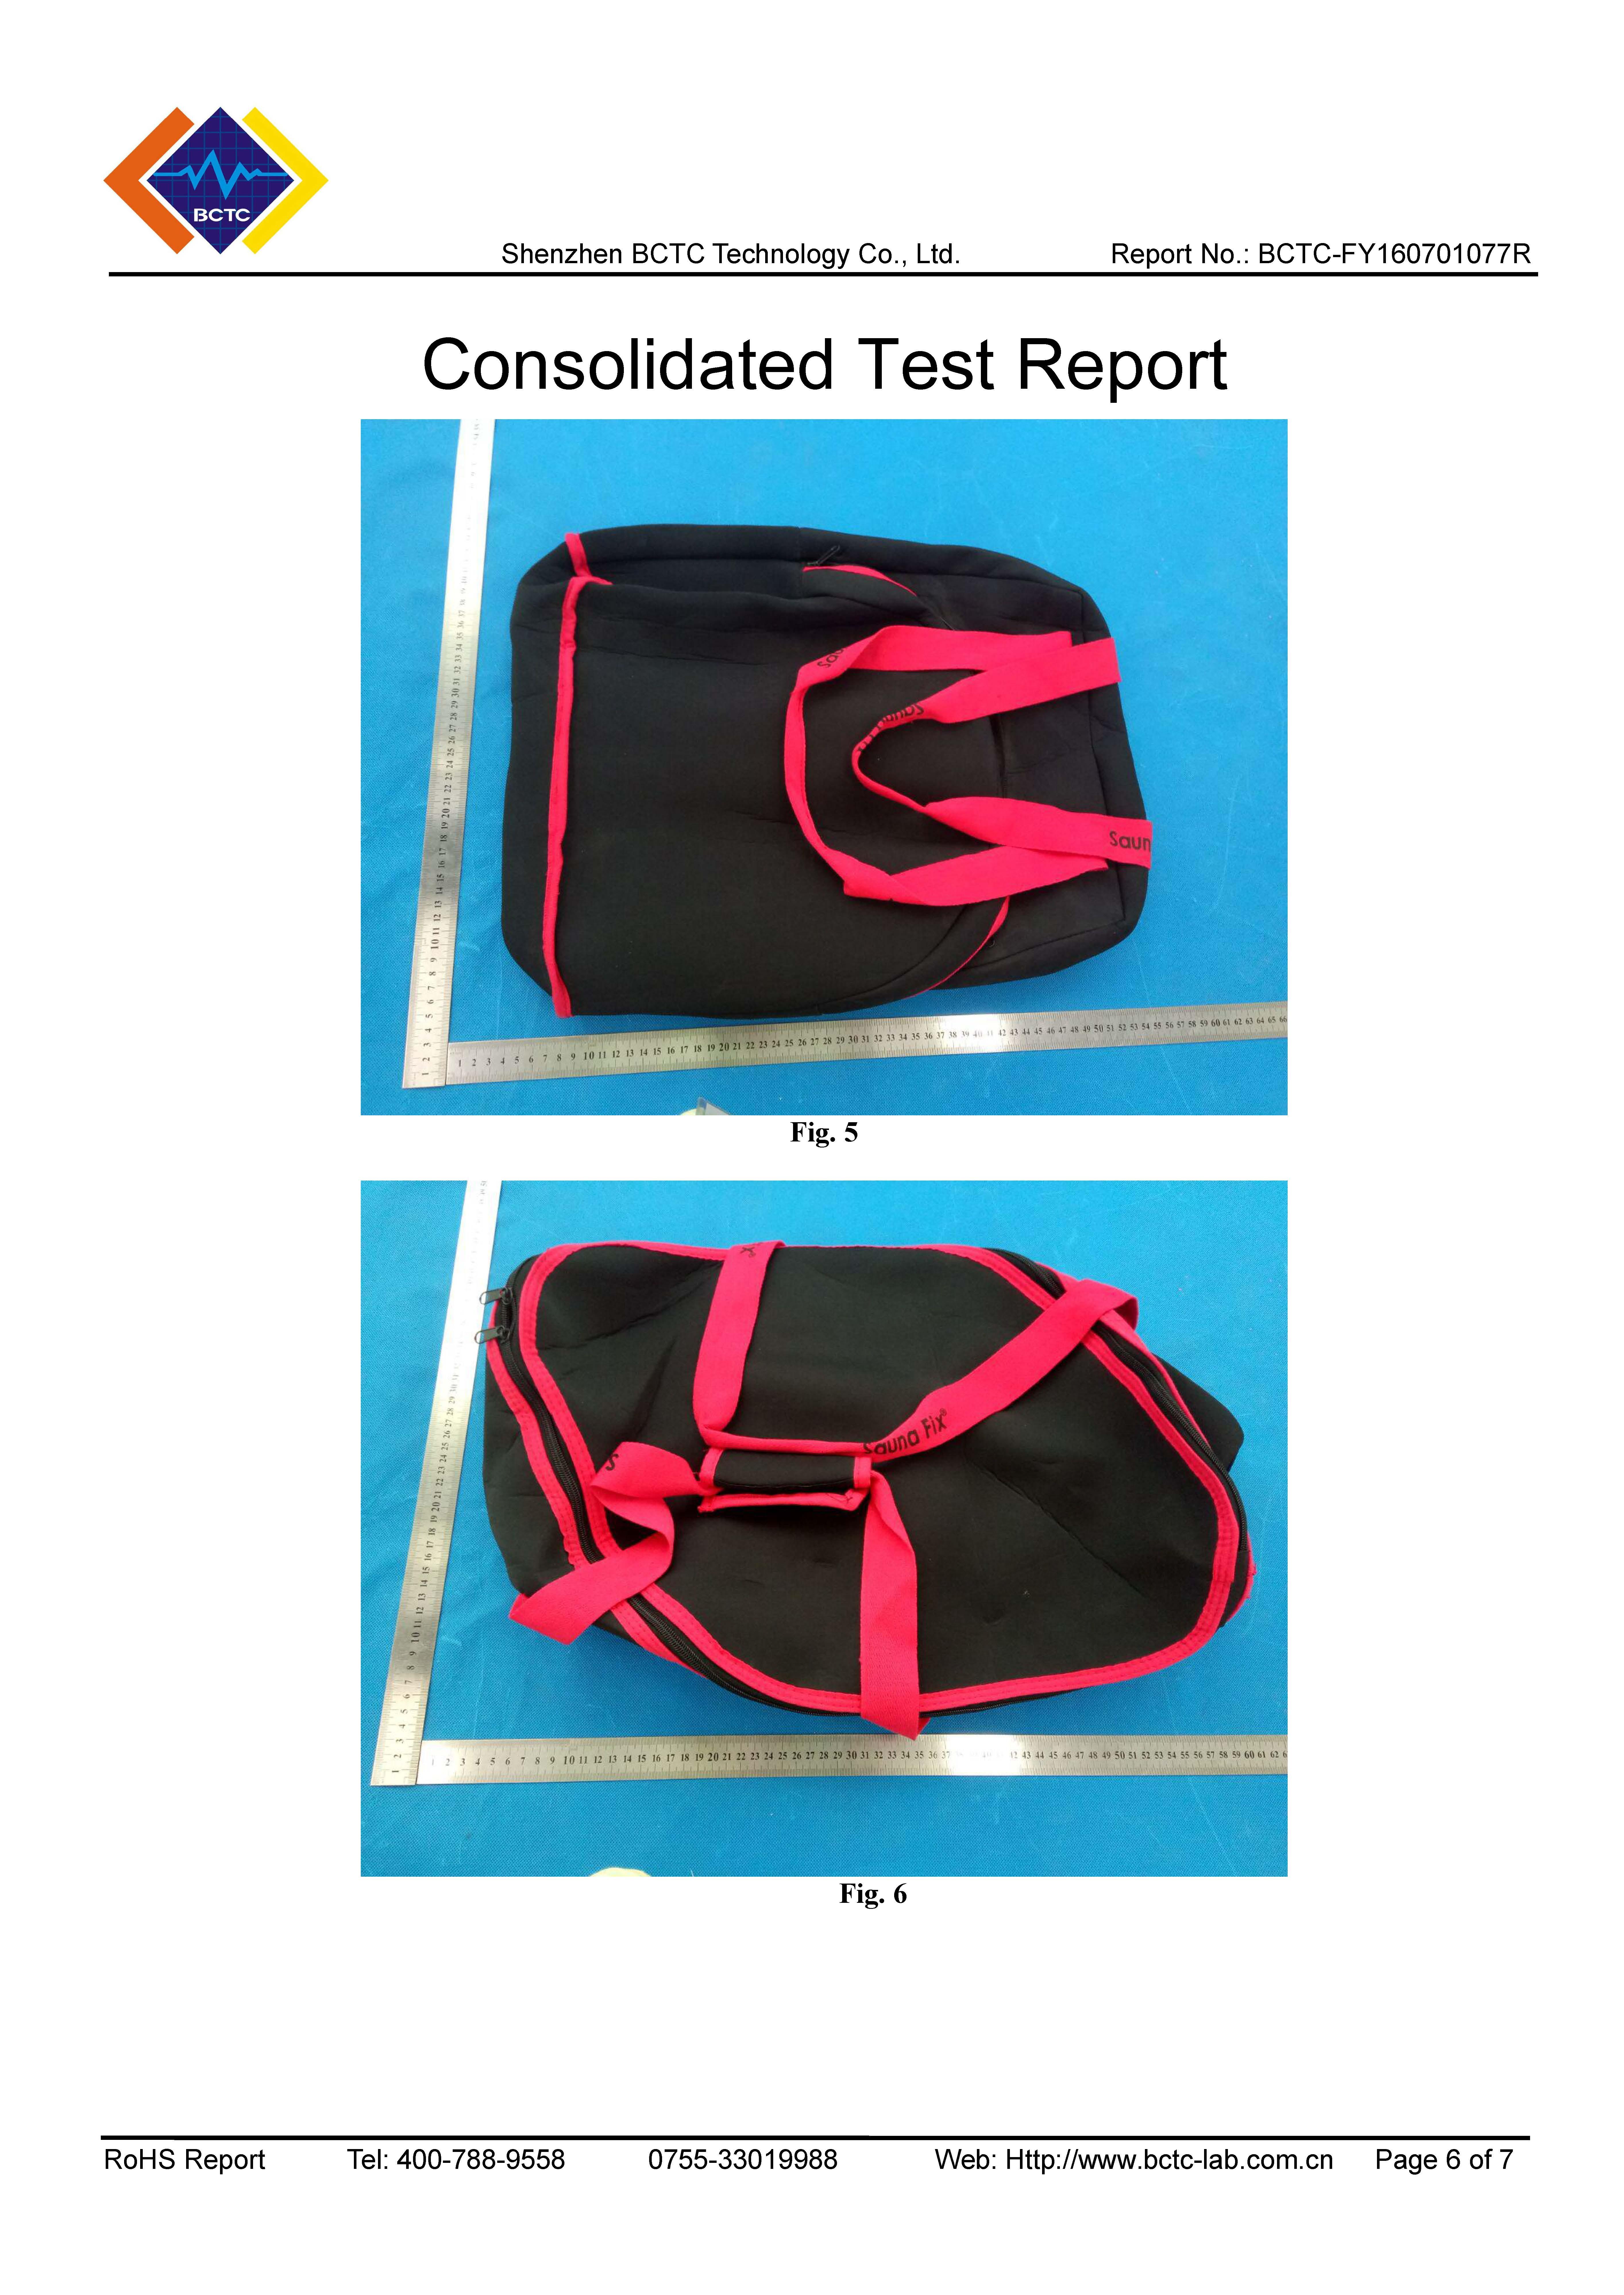 sauna-fix-tent-rohs-report-page-6.jpg